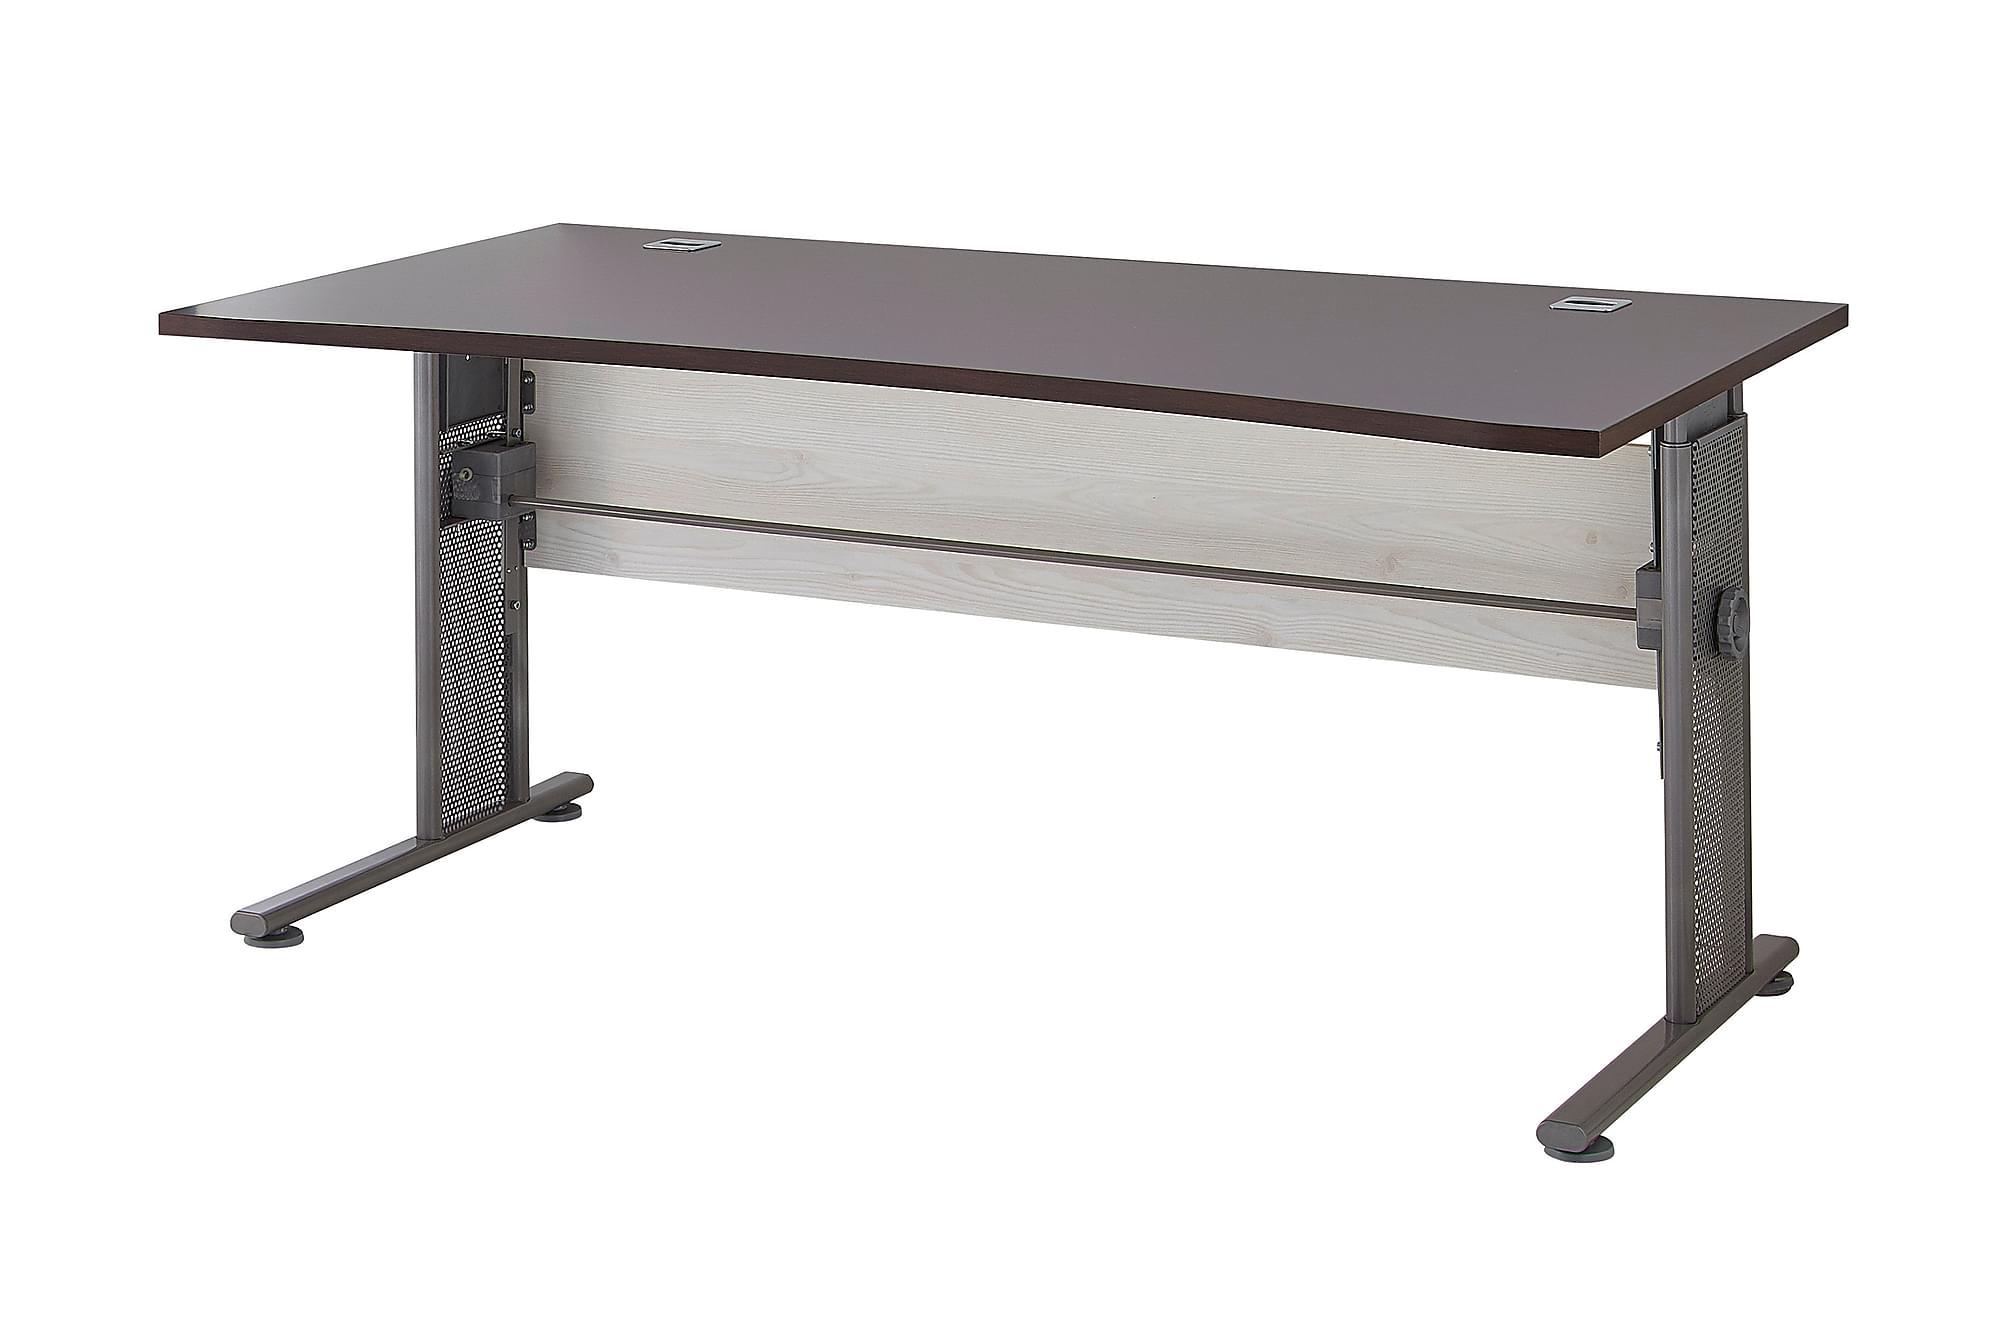 PRAXIS Skrivbord 160 Brun/Grå/Metall